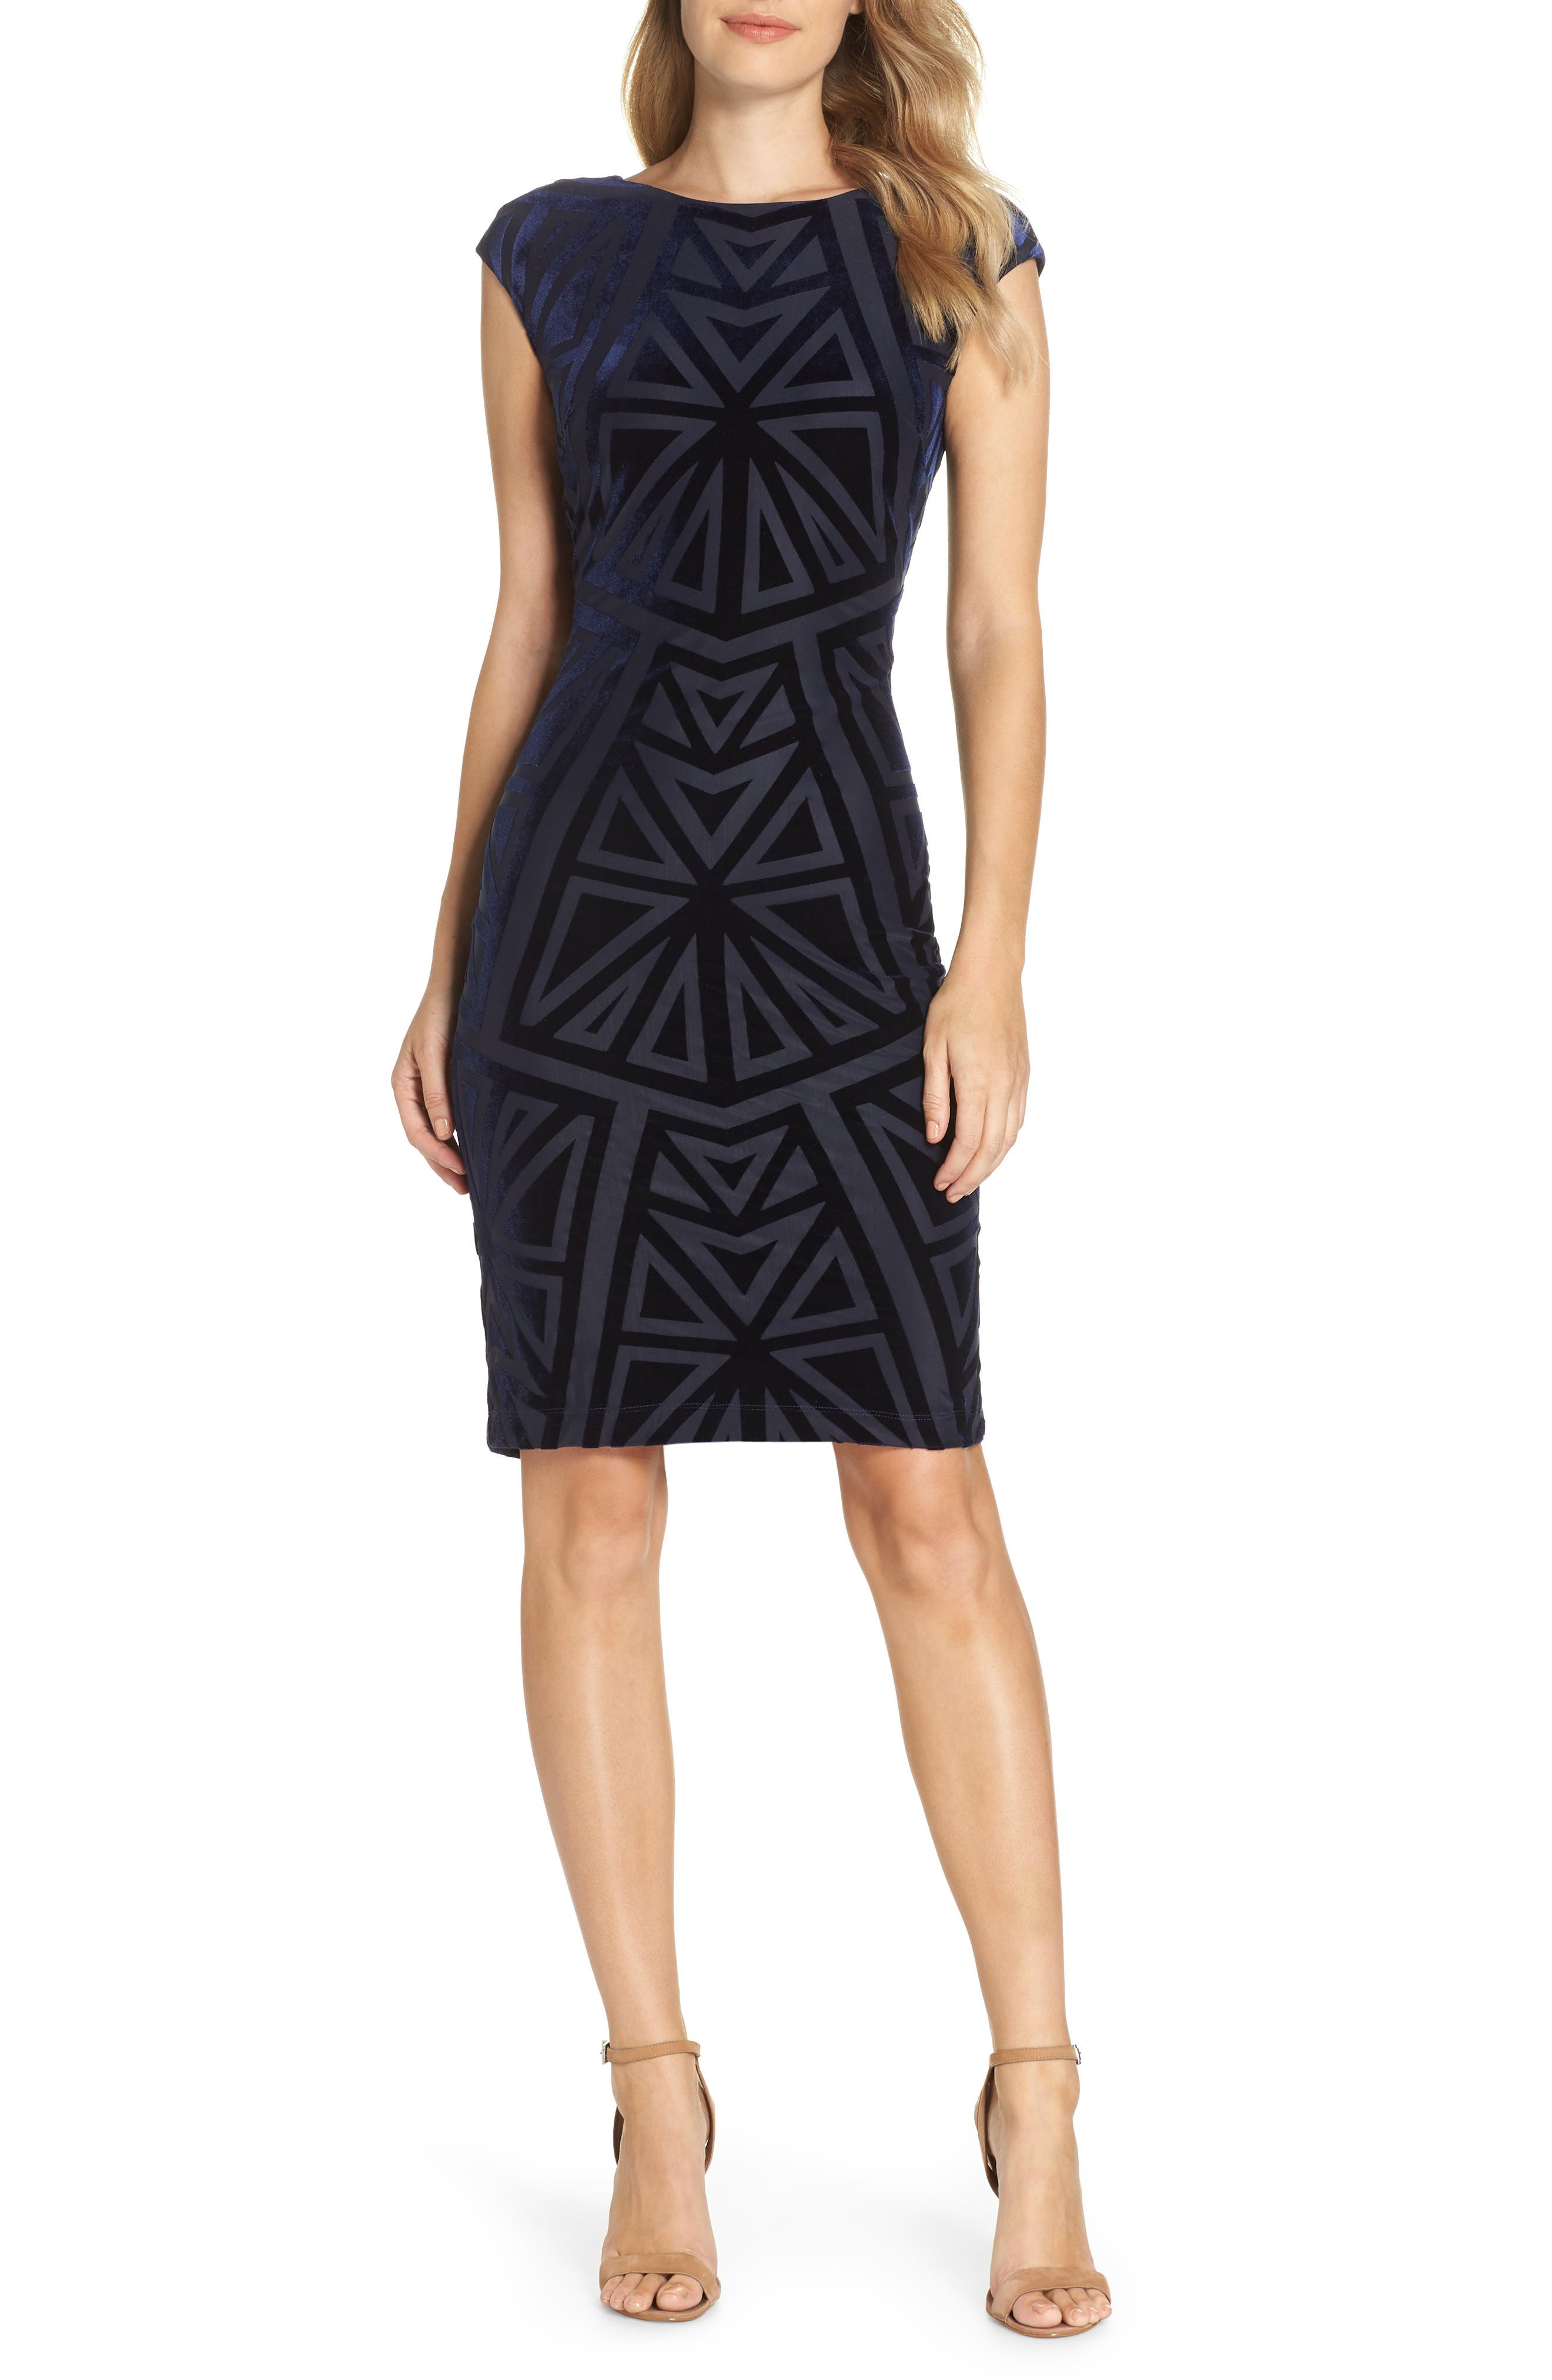 Vintage 1920s Dresses – Where to Buy Womens Vince Camuto Velvet Jacquard Sheath Dress Size 18 similar to 14W - Blue $148.00 AT vintagedancer.com